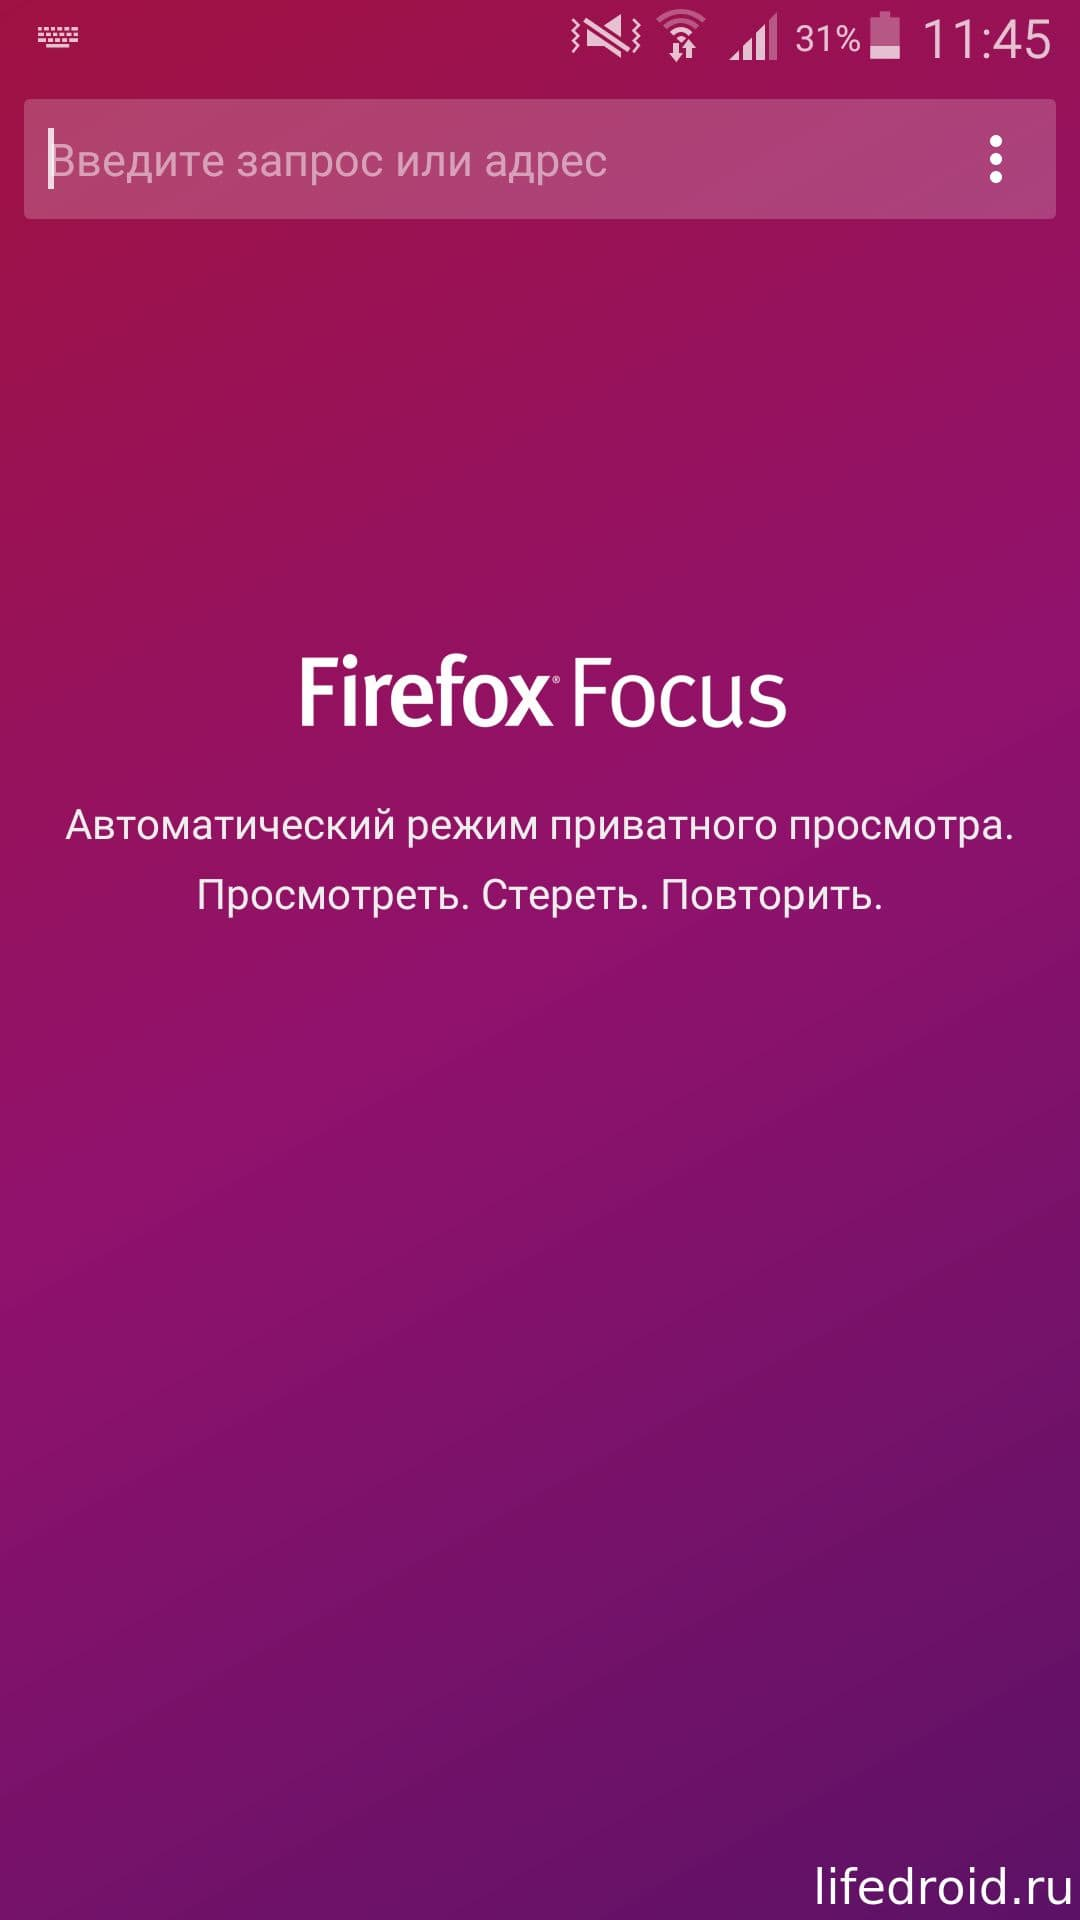 Минималистичный браузер Firefox Focus